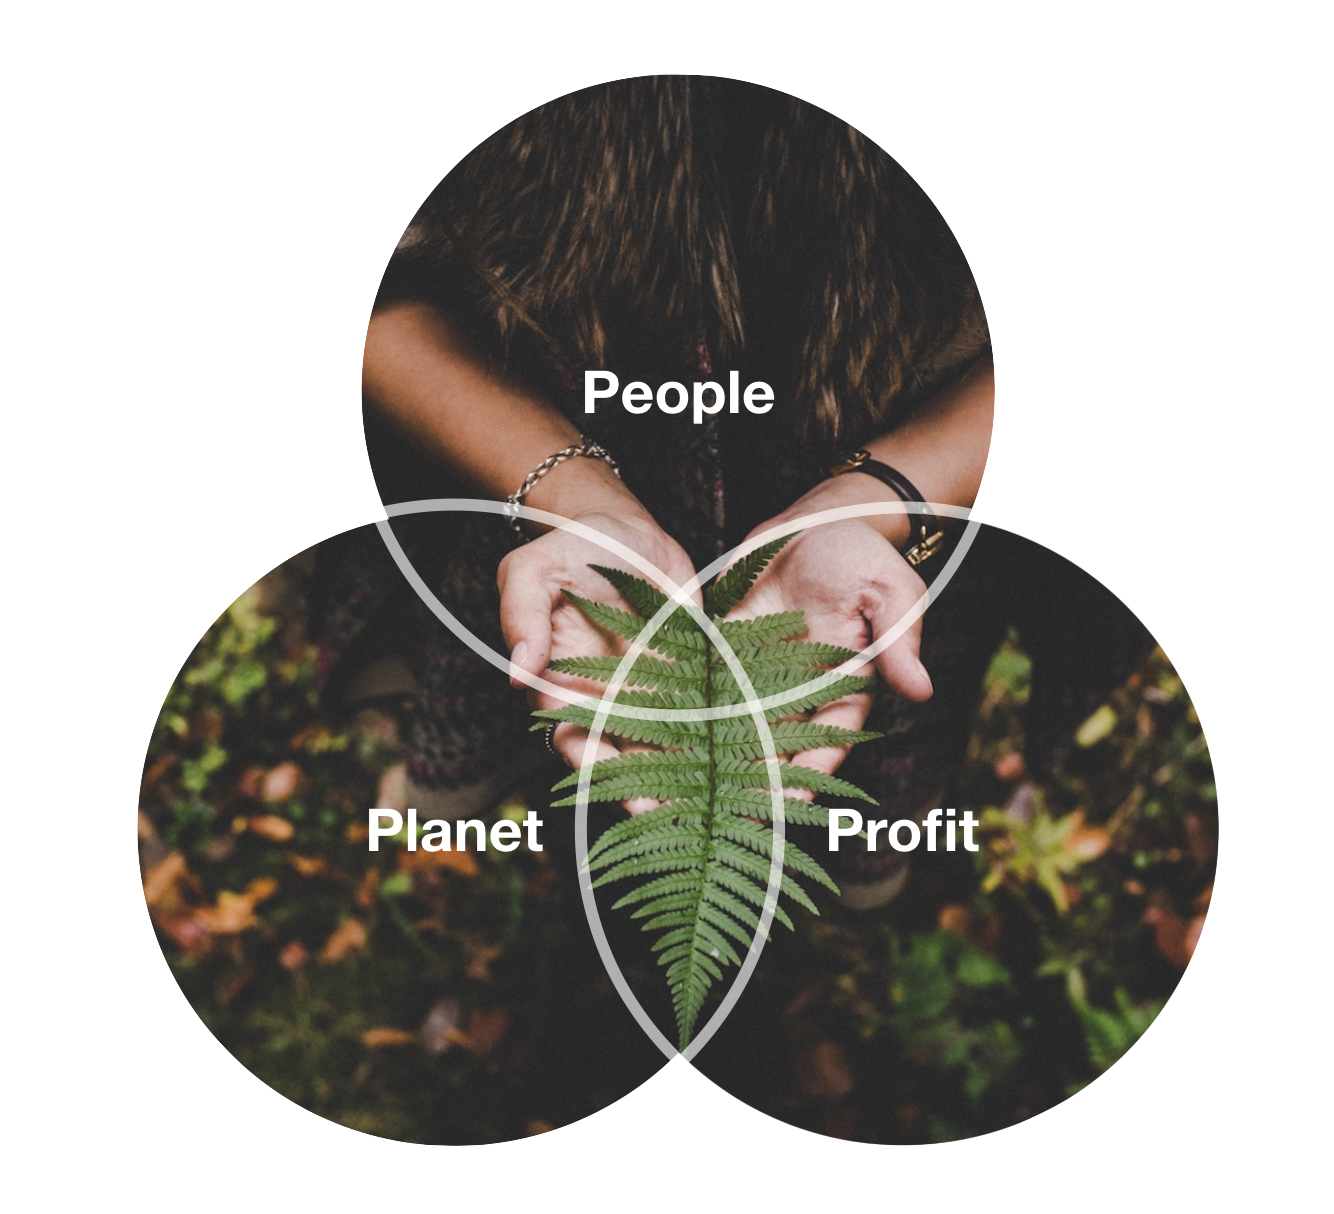 people-profit-planet